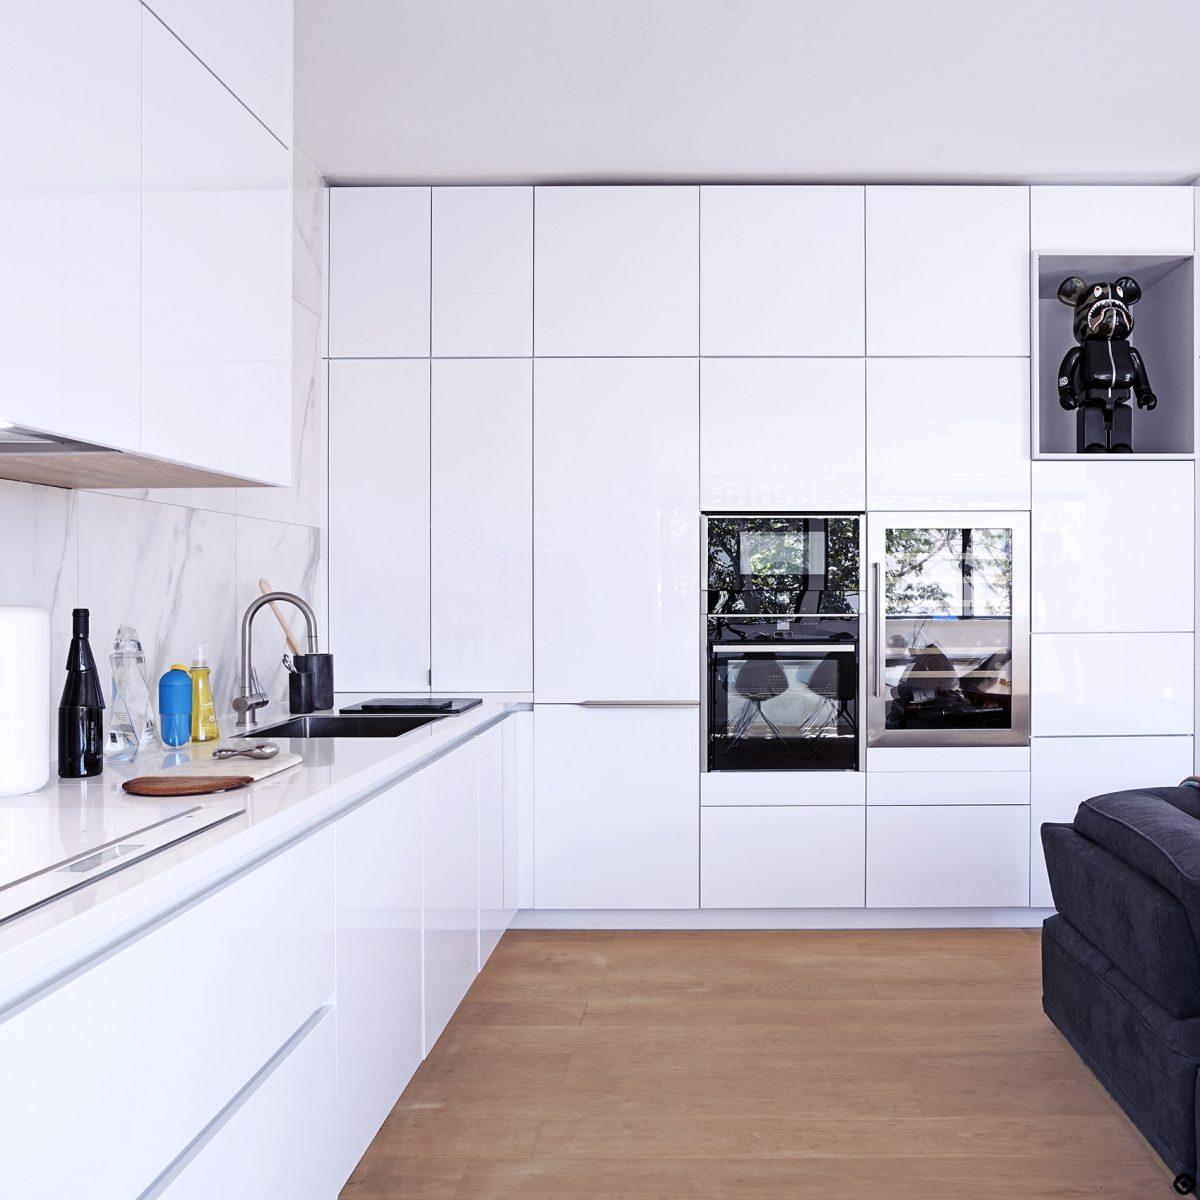 blog-design-cuisine-sur-mesure-schmidt_16